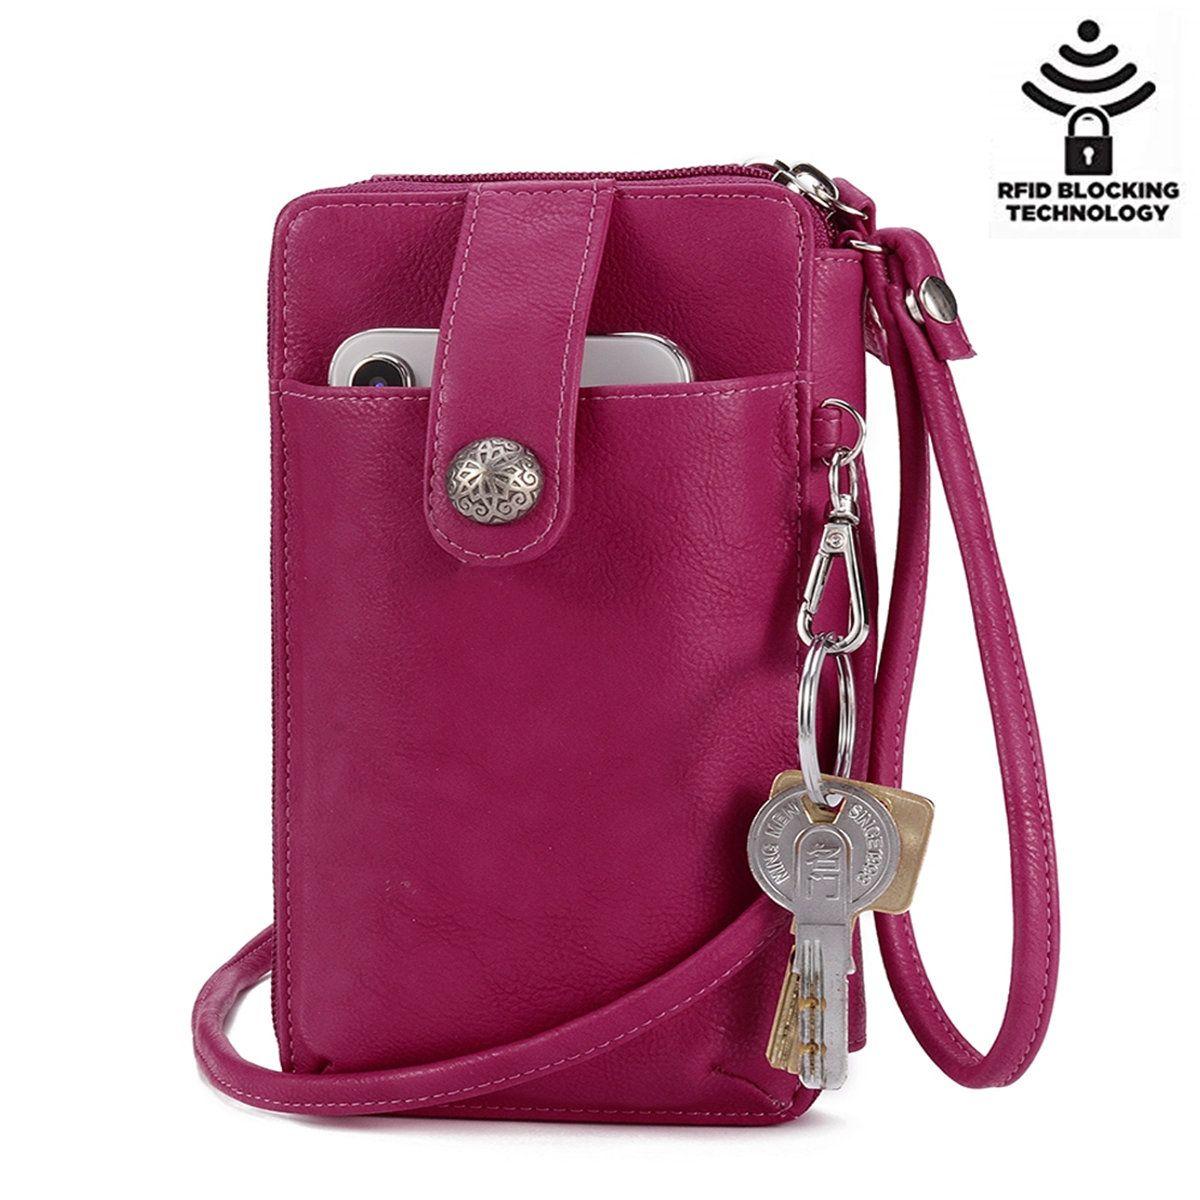 8f6af0bc465c6 Hot-sale designer Brenice Women Square Card Holder Phone Bag Multi-layer  Crossbody Bag Online - NewChic Mobile